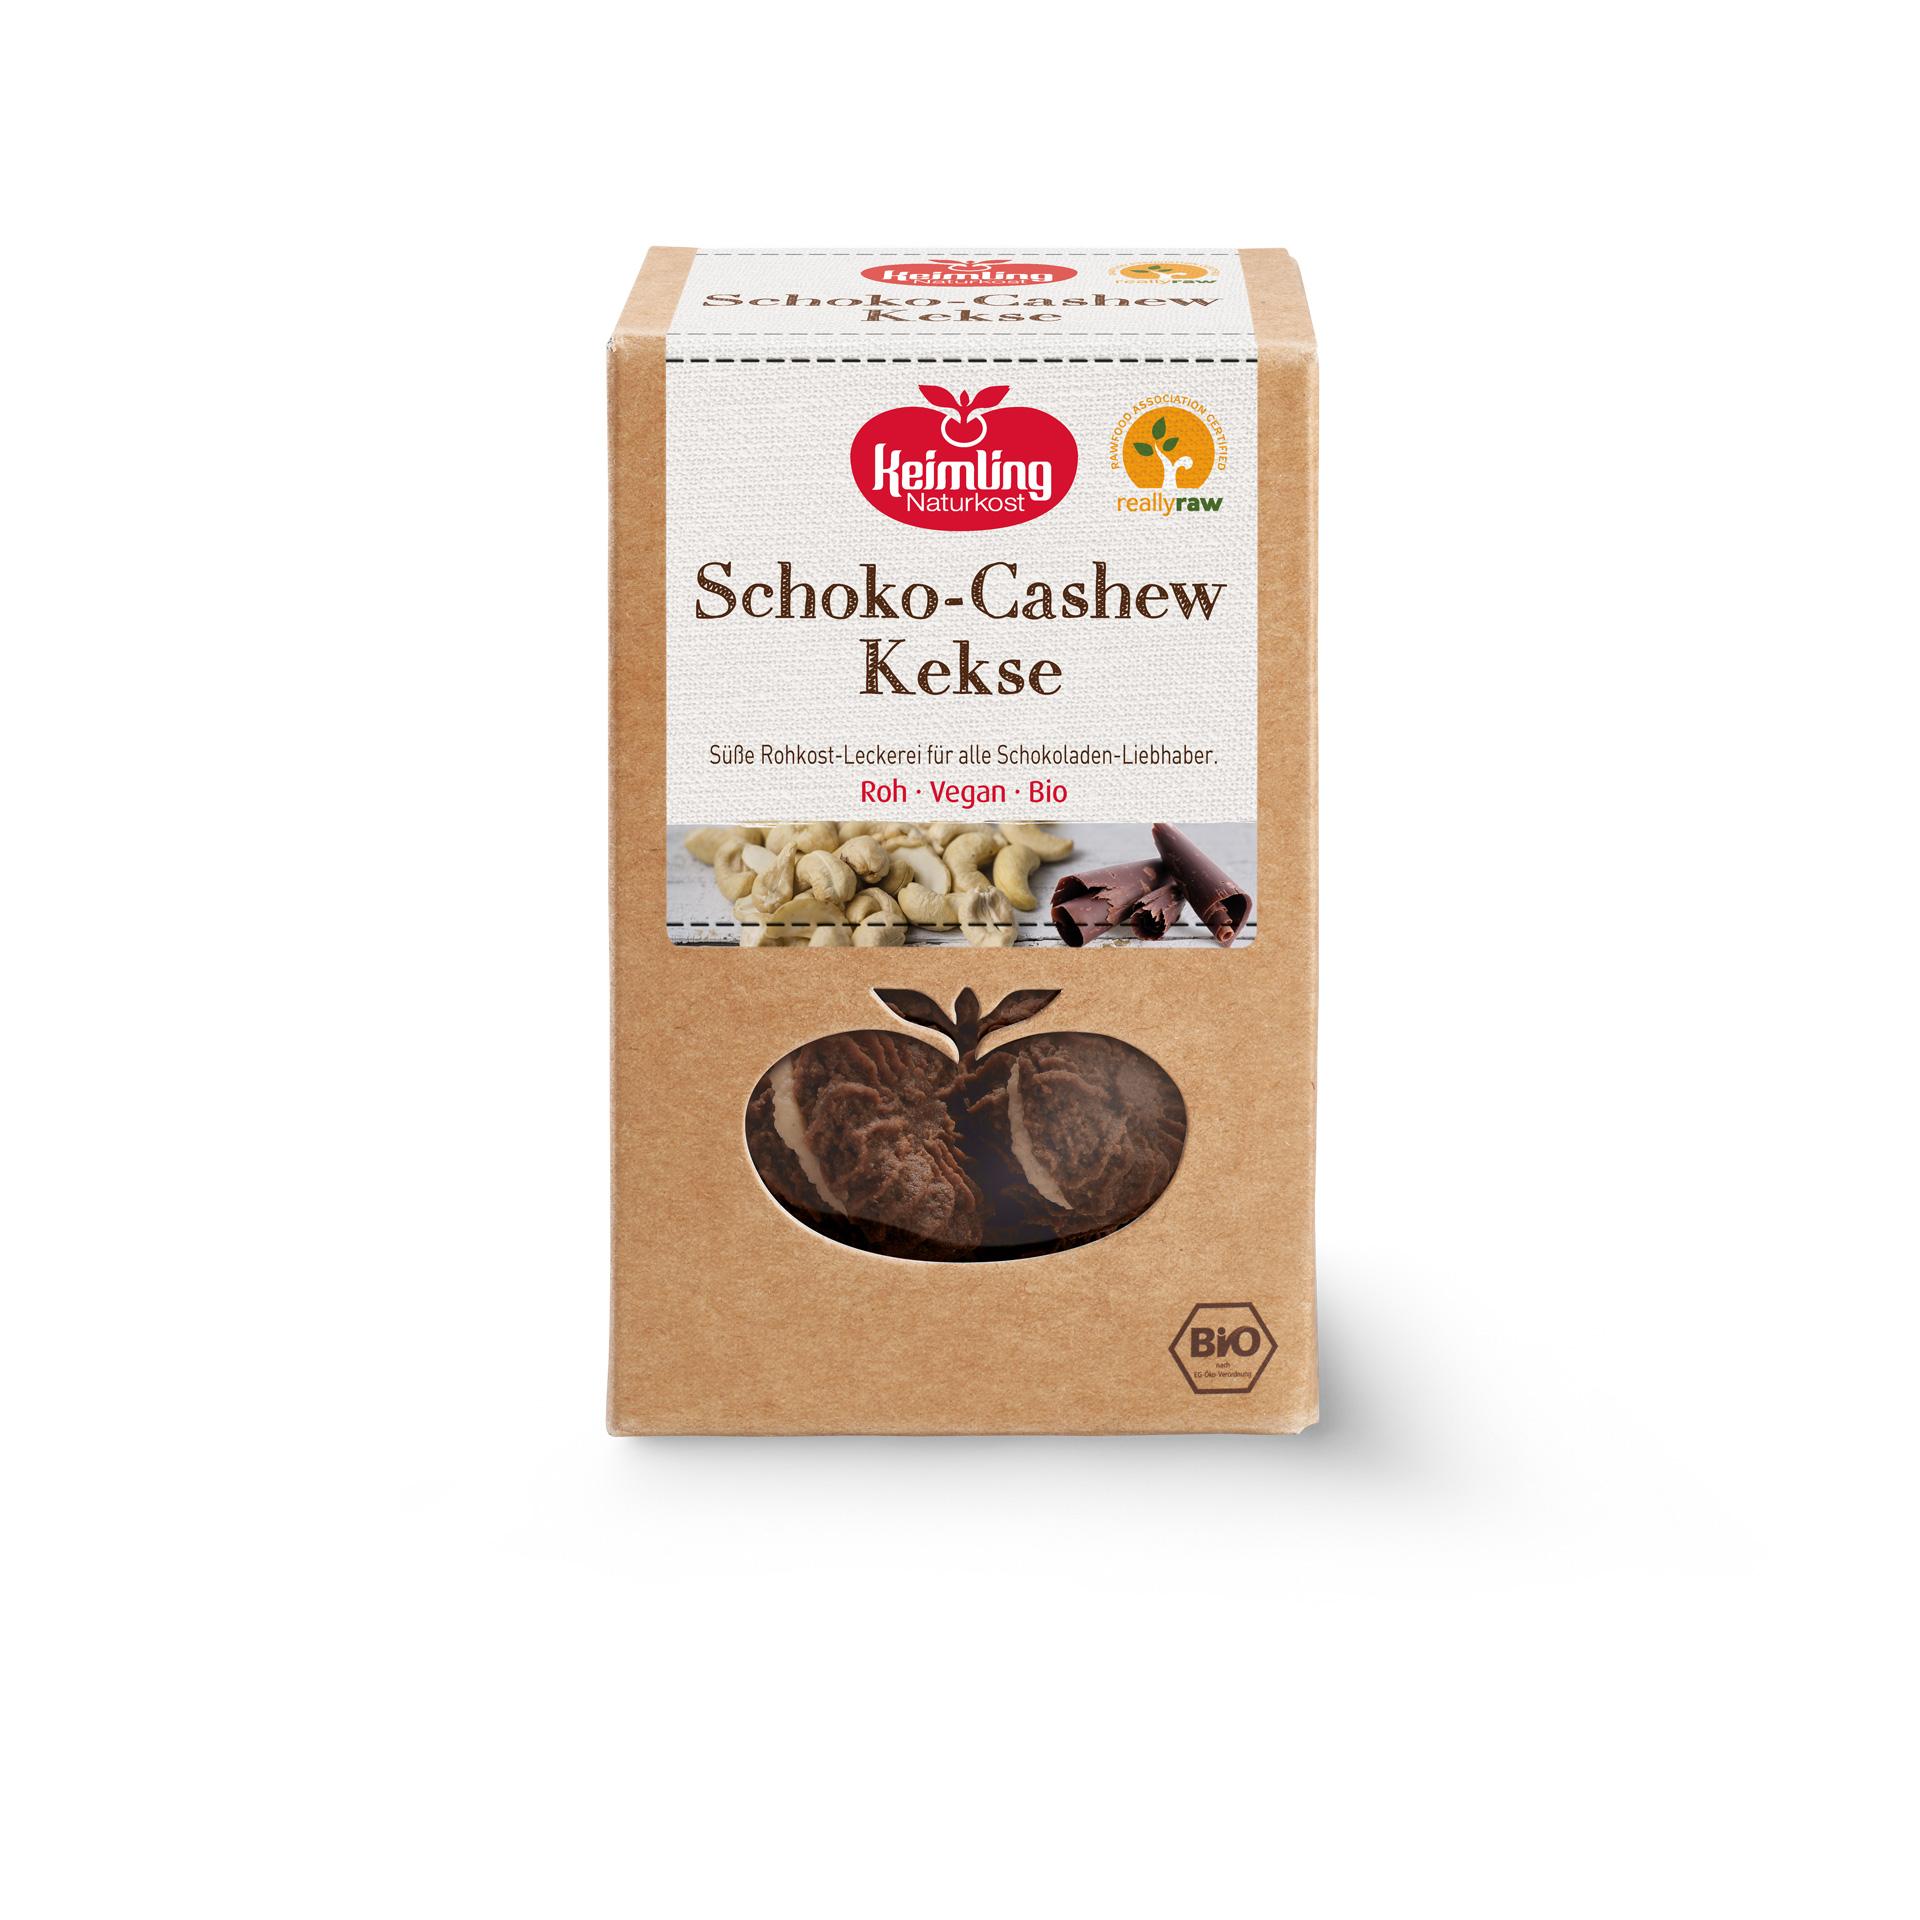 Rohkost-Kekse-cashew-schoko RR 1920x1920